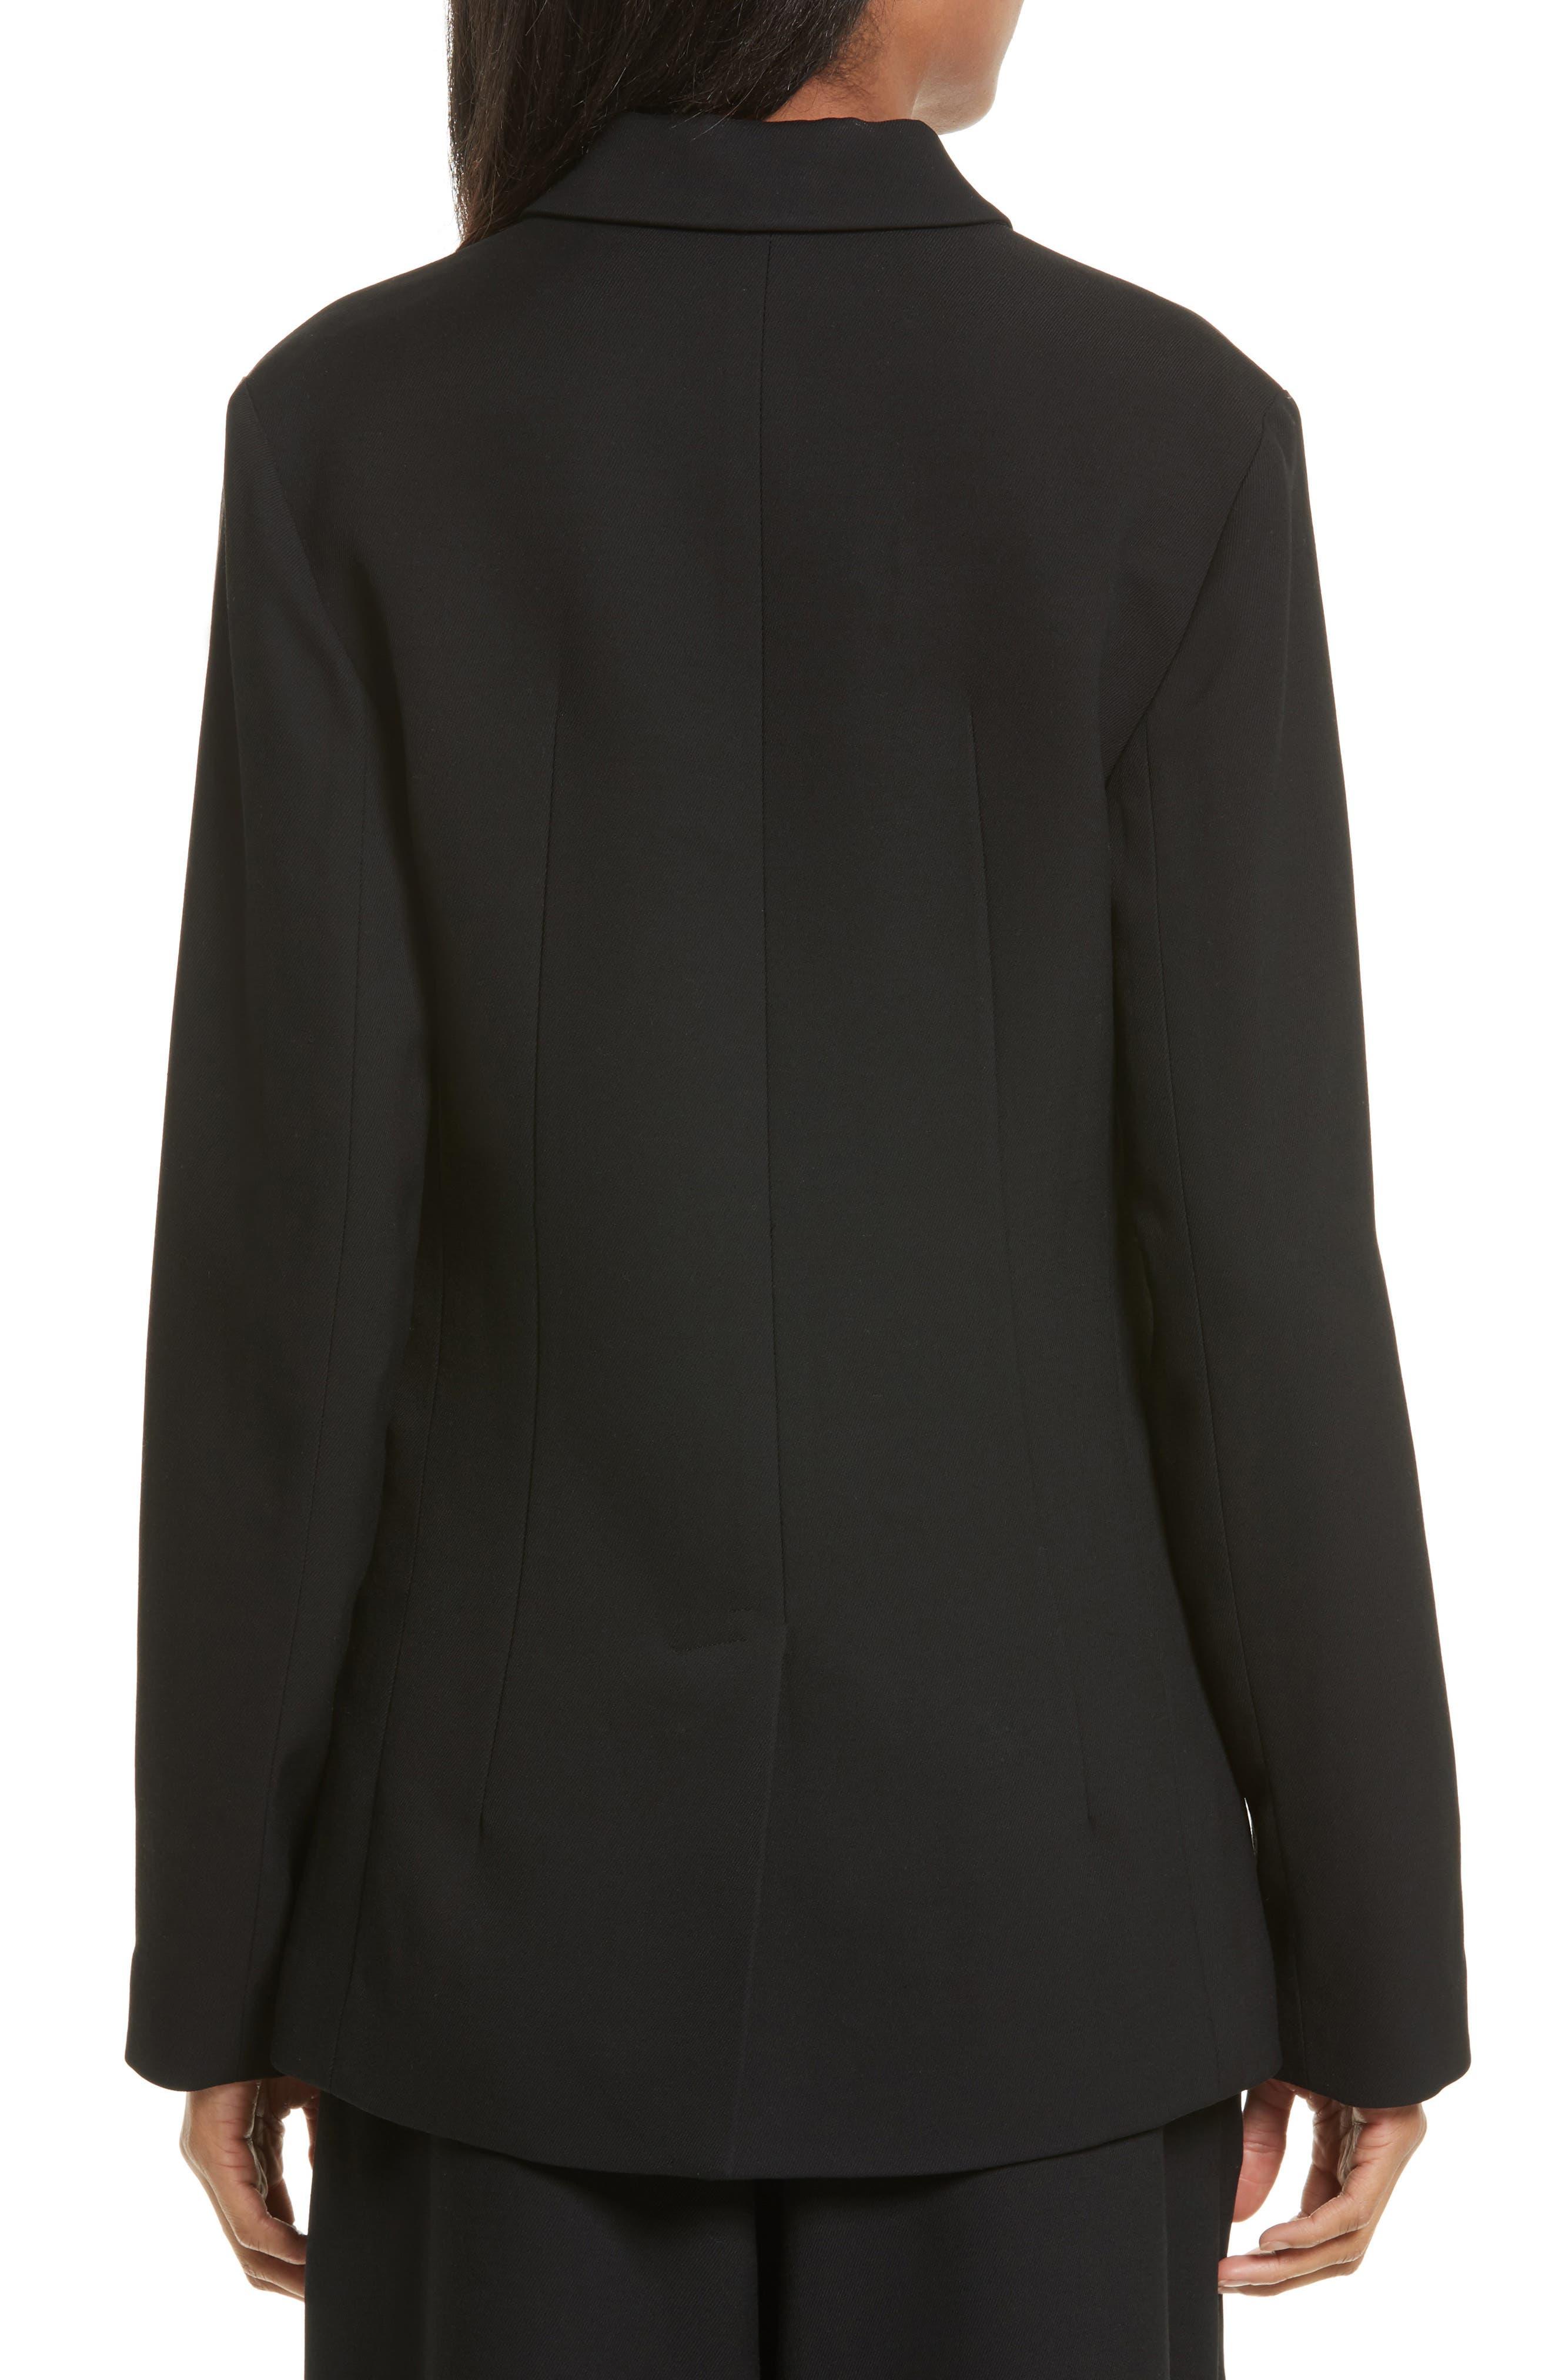 Classon Jacket,                             Alternate thumbnail 3, color,                             Black